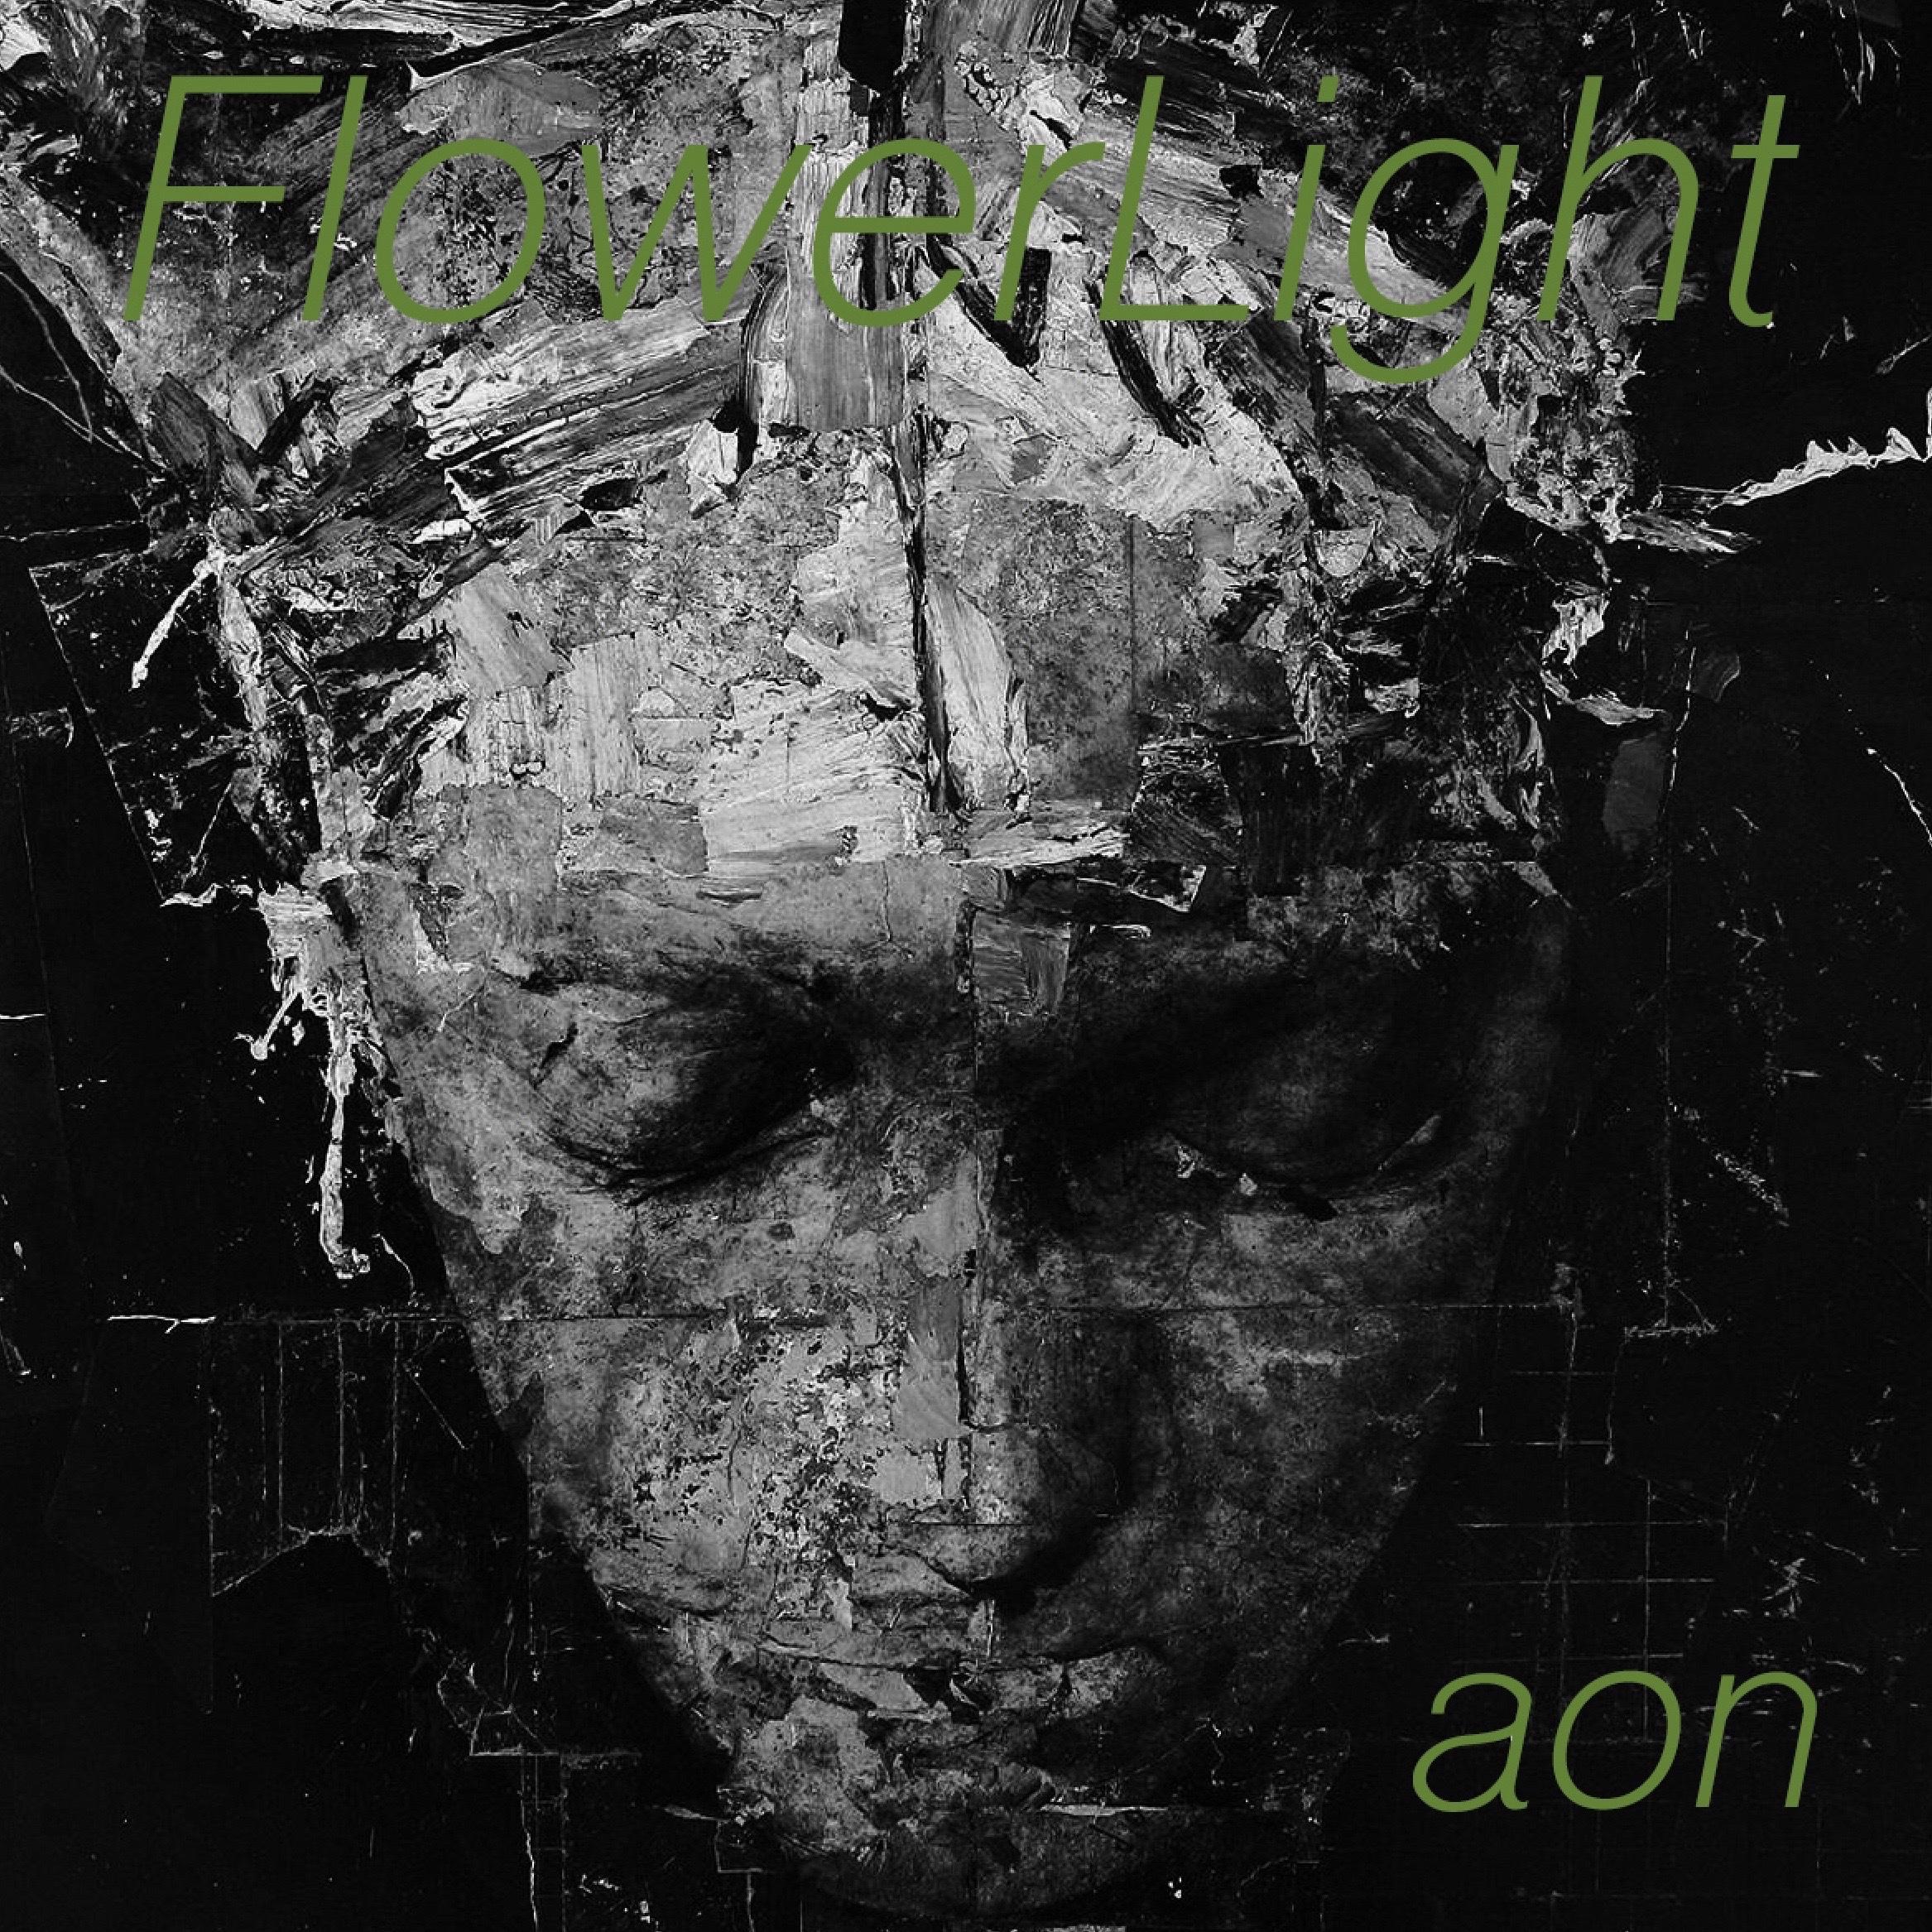 FlowerLight Aon EP Sleeve.jpg